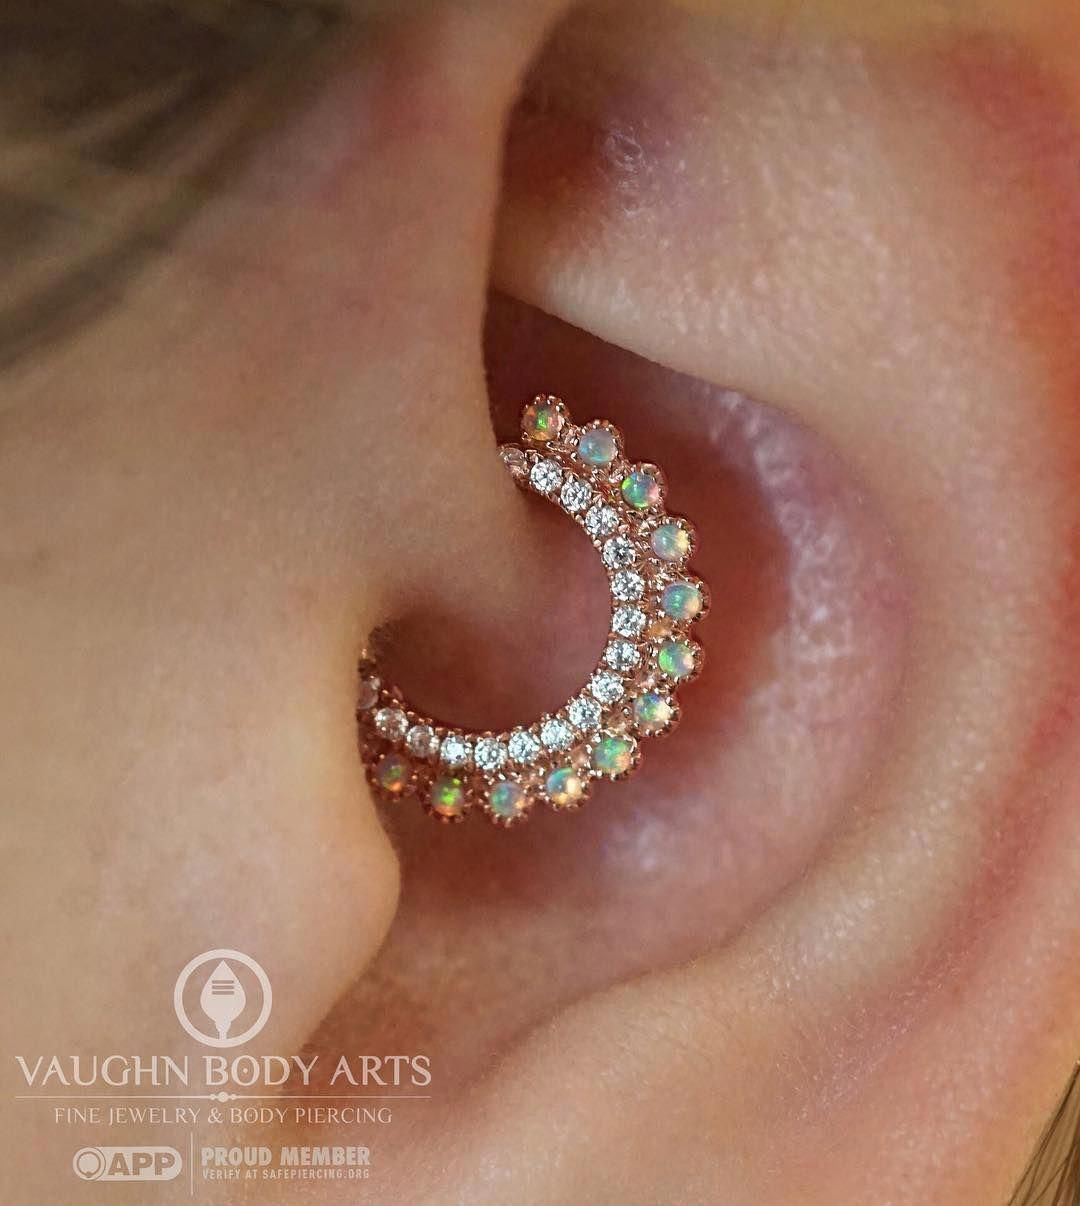 Nose piercing without jewelry  Instagram bodyjewelry  Tattoos  Pinterest  Jewelry Piercings